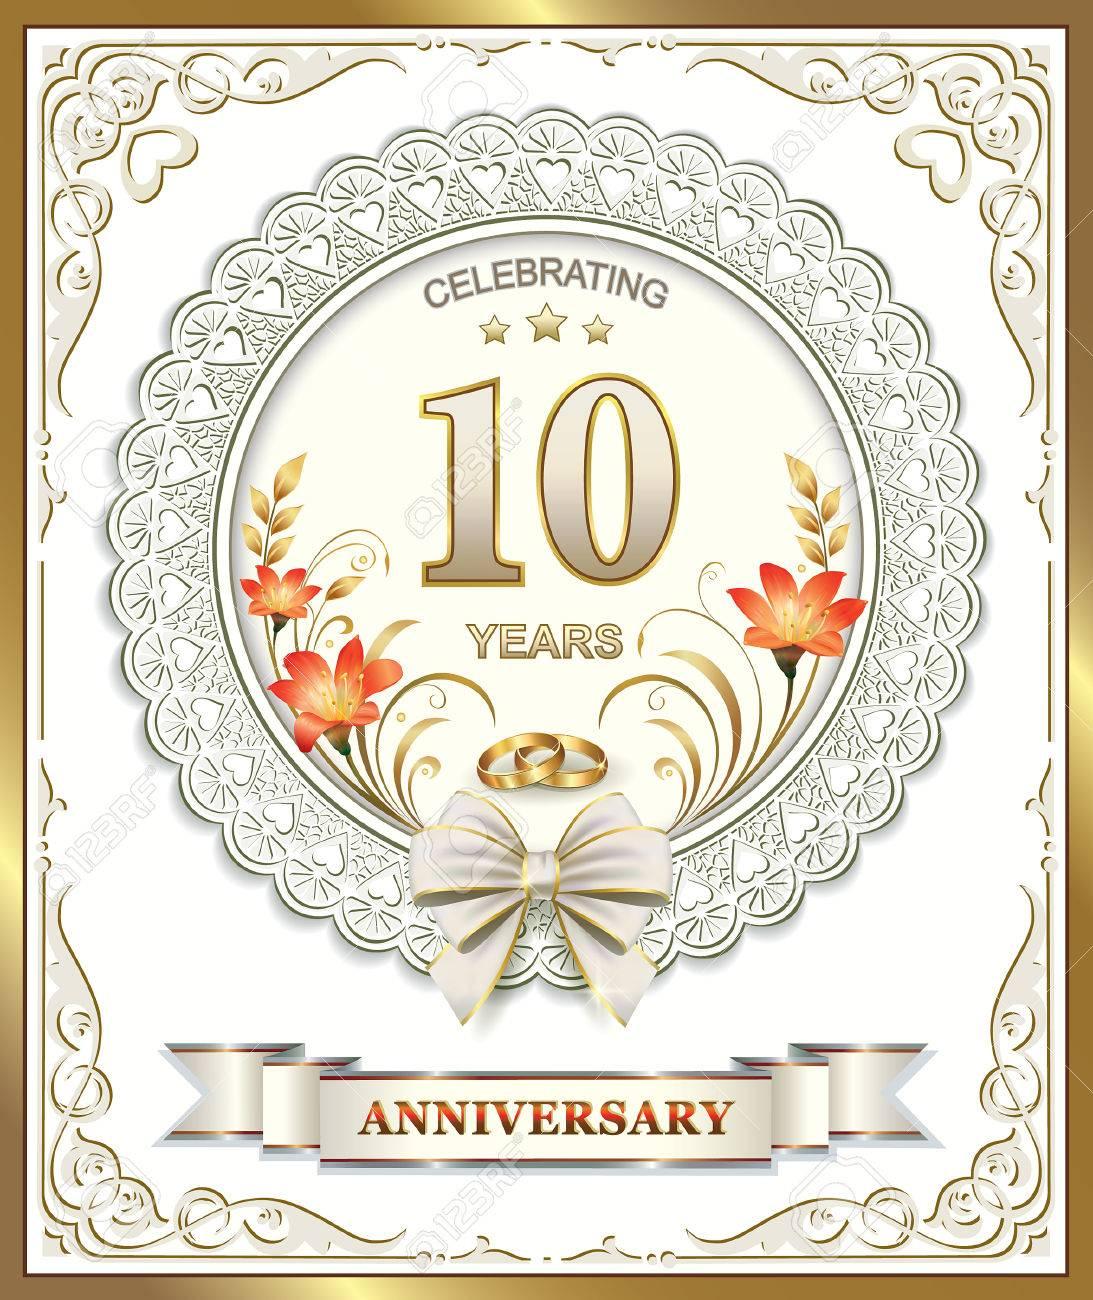 Anniversario Di Matrimonio Dieci Anni.Greeting Card With 10 Wedding Anniversary Royalty Free Cliparts